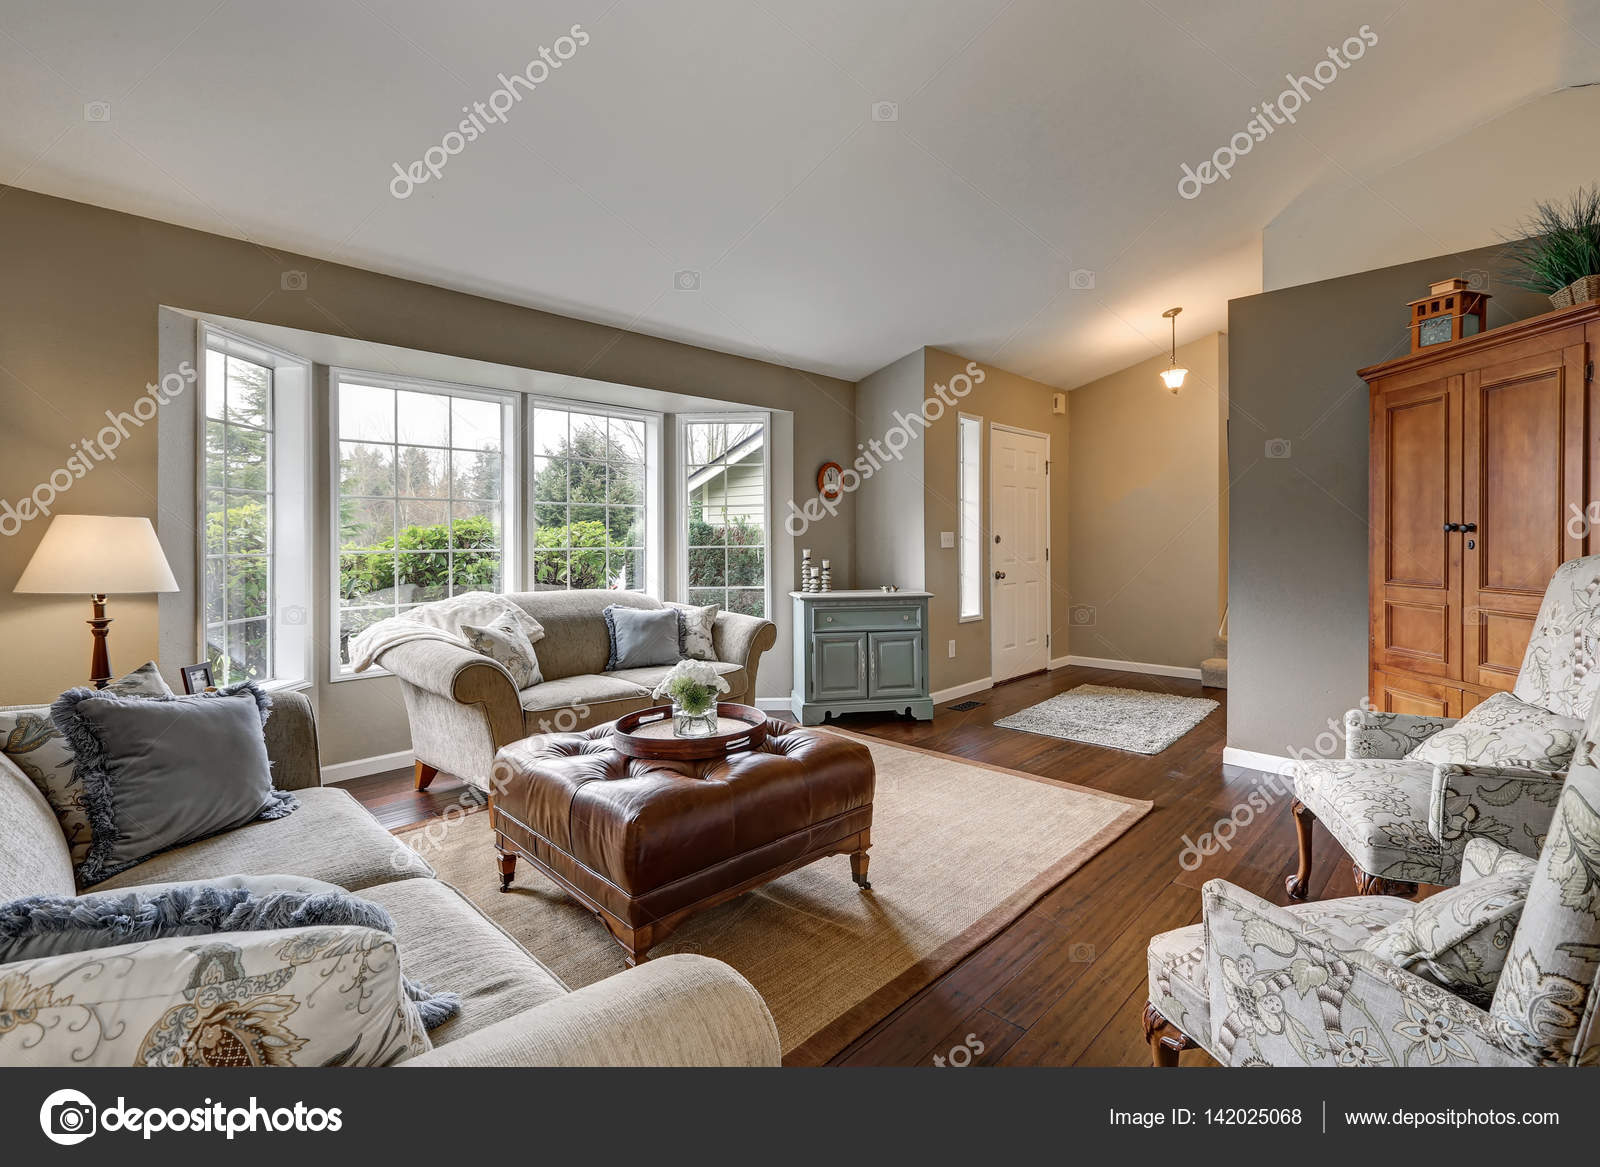 gezellige familie kamer interieur met traditionele amerikaanse design stockfoto